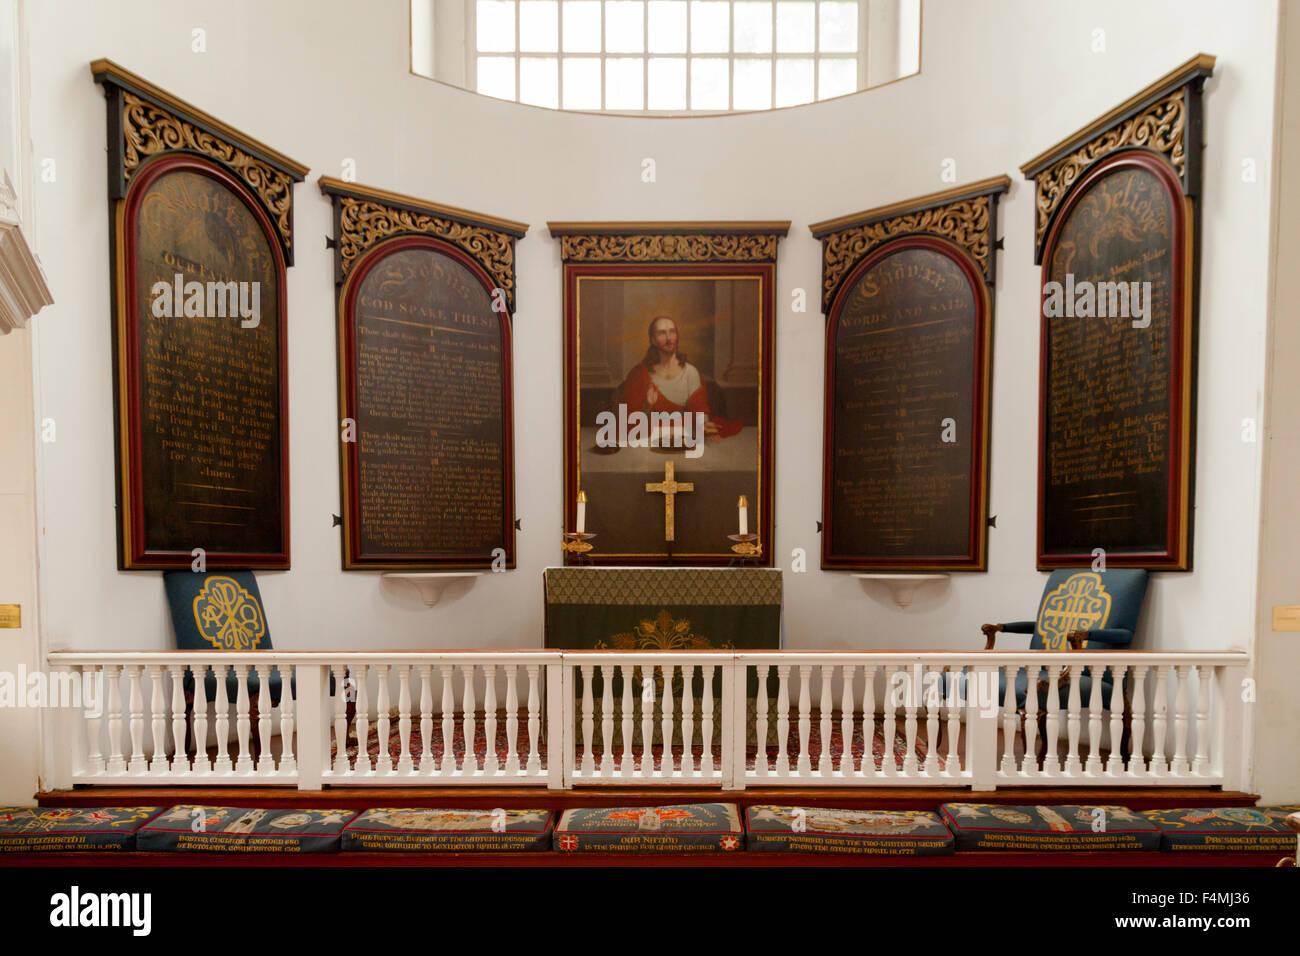 El altar, la Old North Church en el Freedom Trail de Boston, Massachusetts, EE.UU. Imagen De Stock